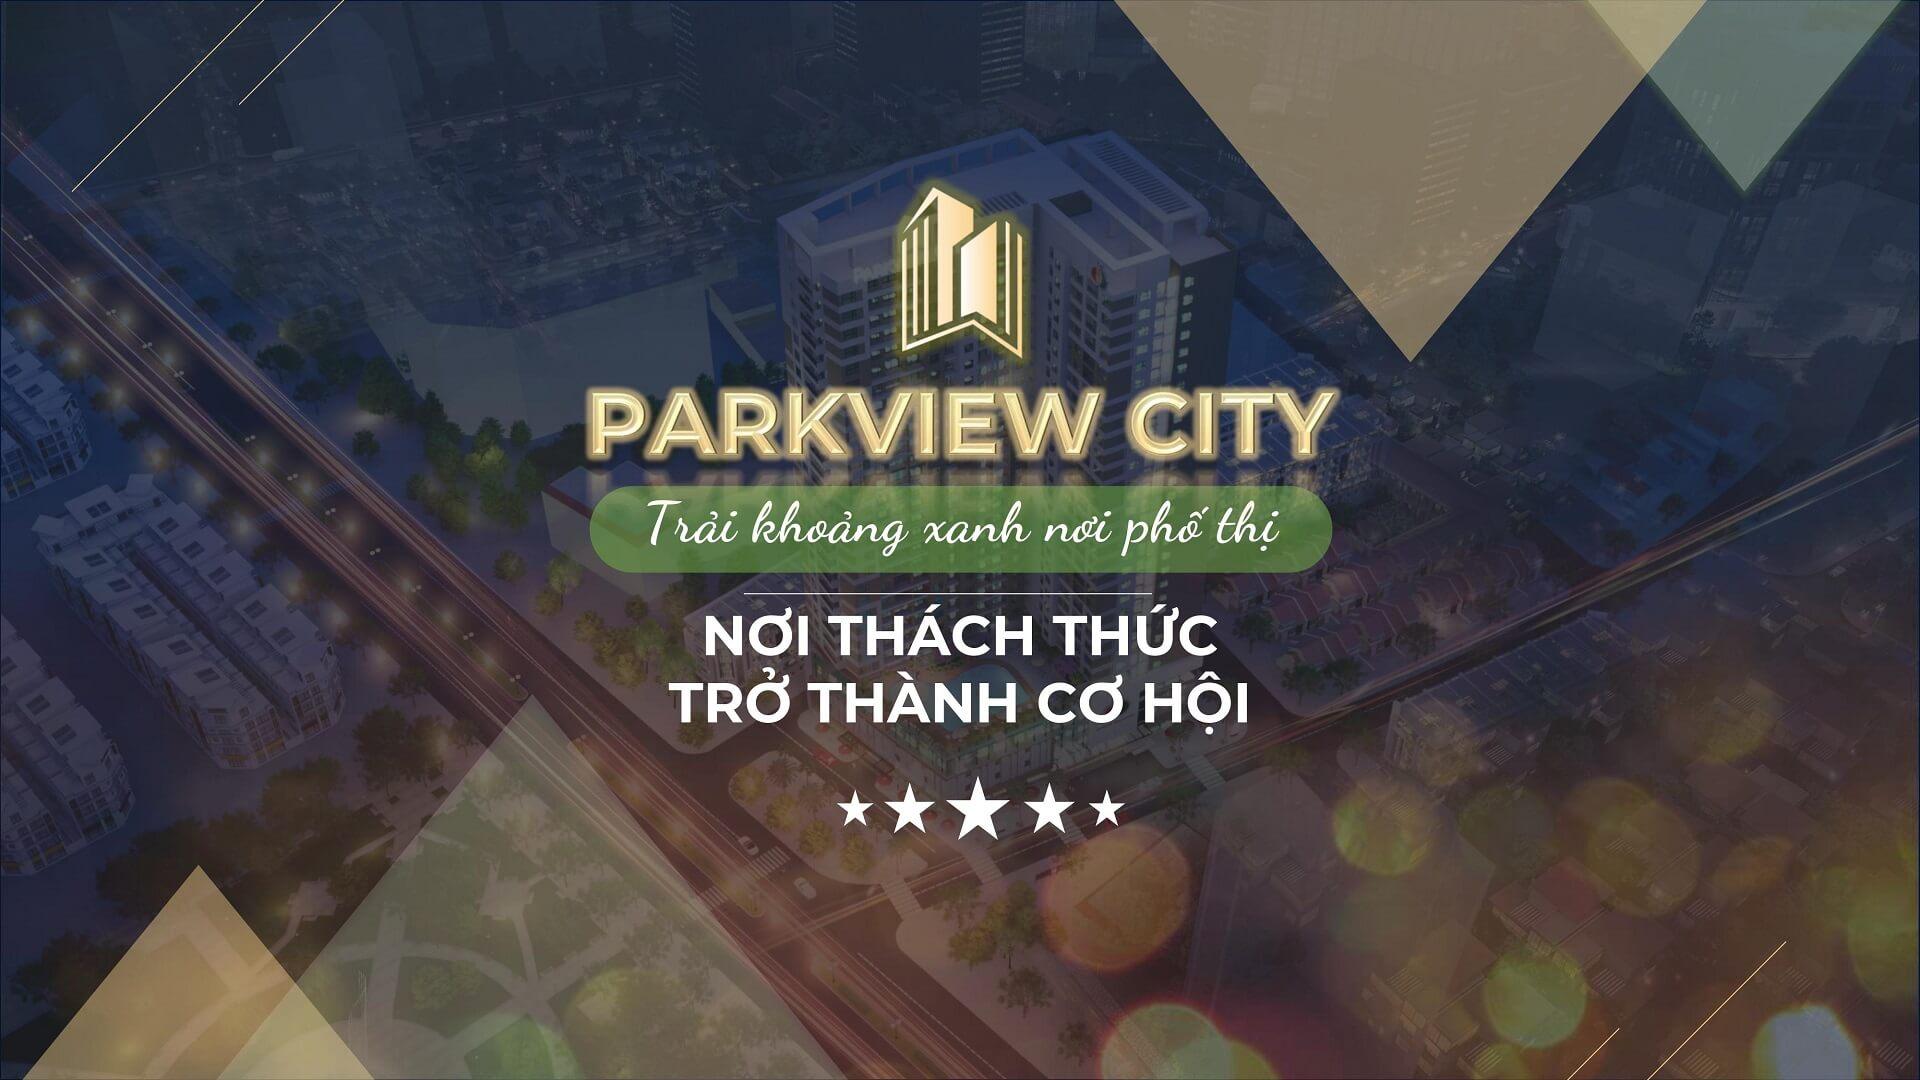 slogan park view city bắc ninh